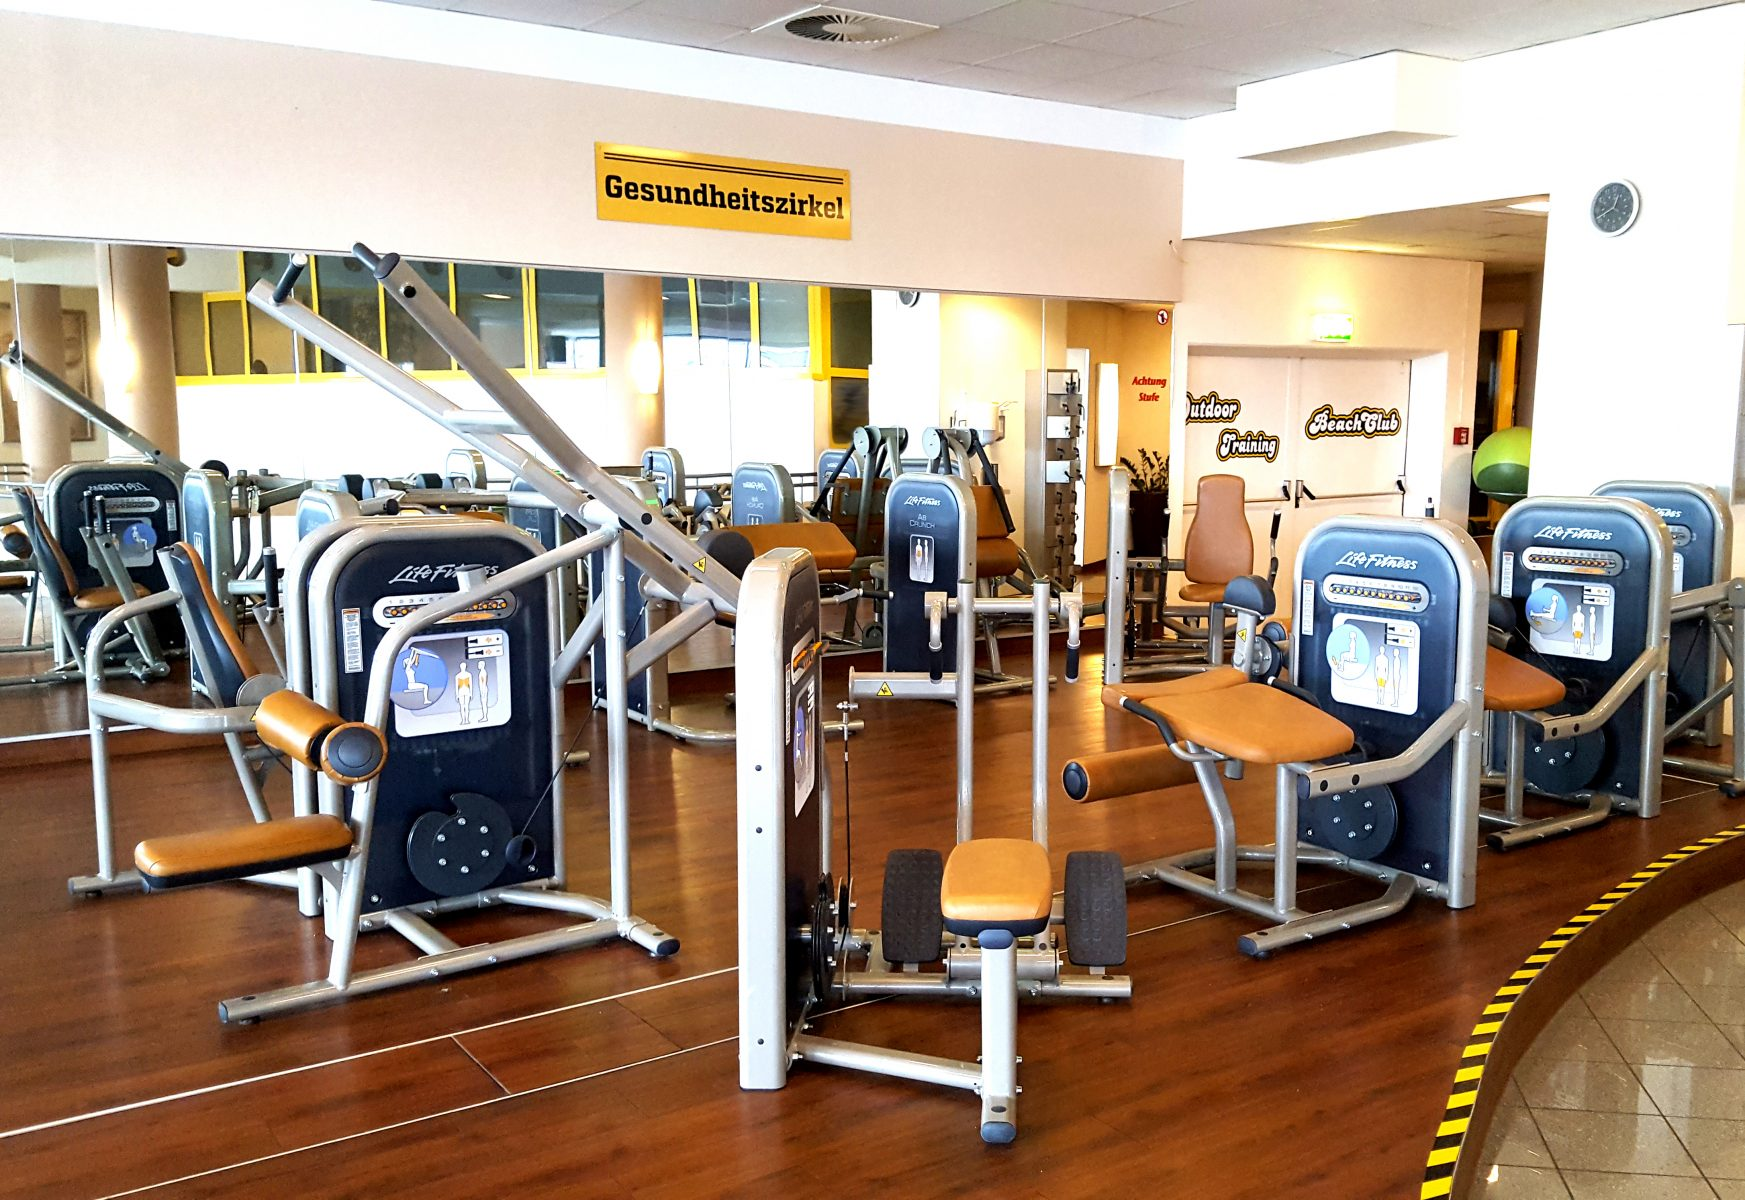 Fitness-Discounter oder Wellness-Tempel? | K.I.E.L. – Das Kieljournal